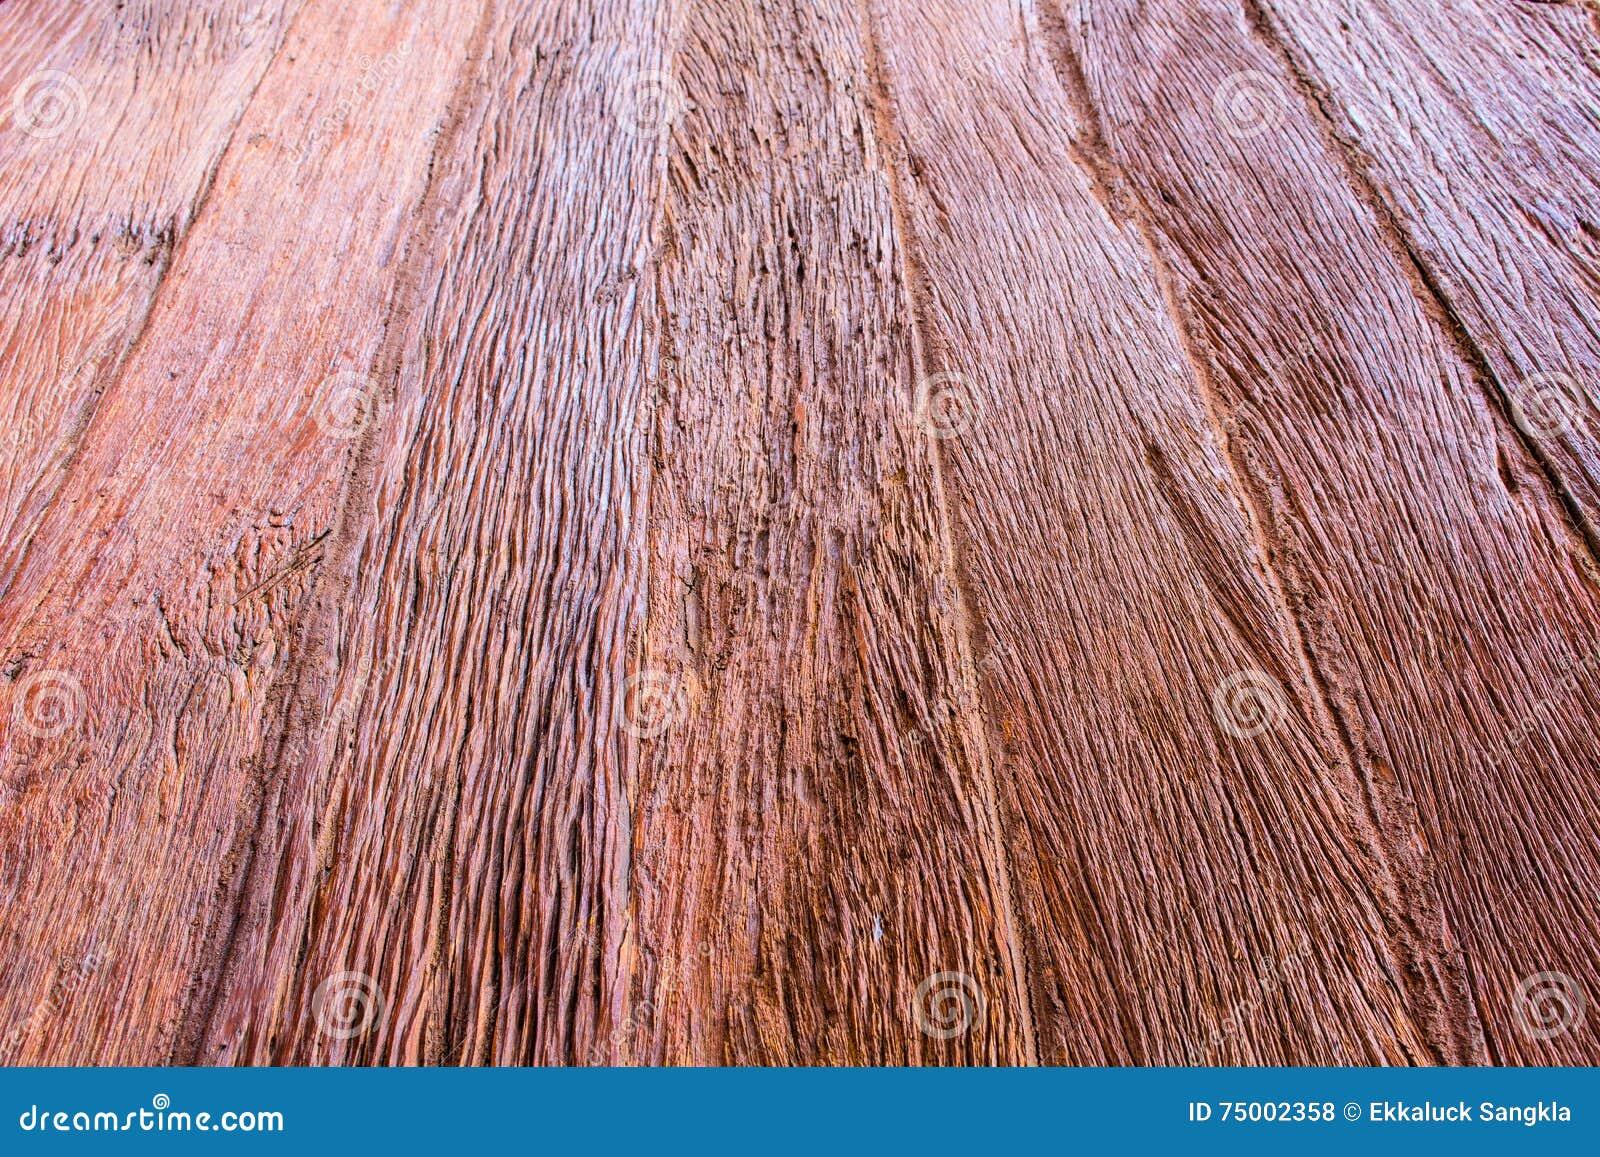 Houten textuur, Houten oppervlakte oude panelen als achtergrond